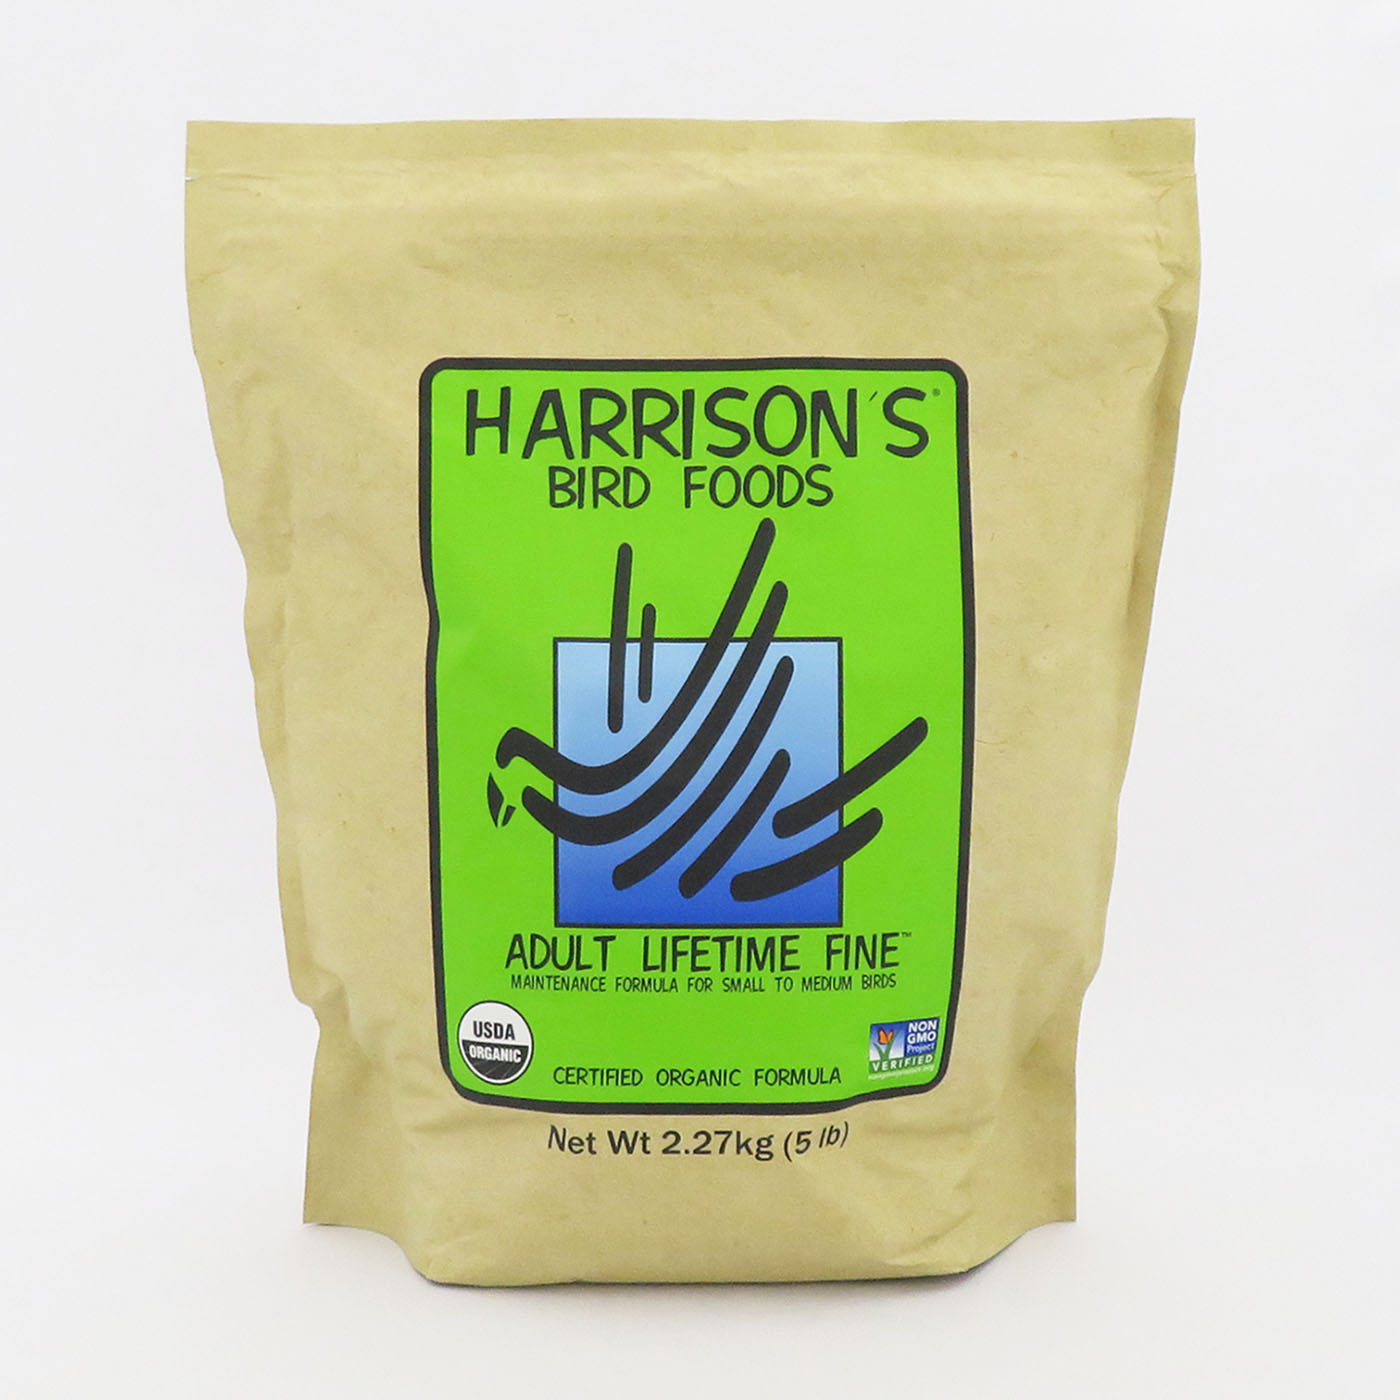 【Harrison】アダルトライフタイム ファイン[小粒]2.27kg